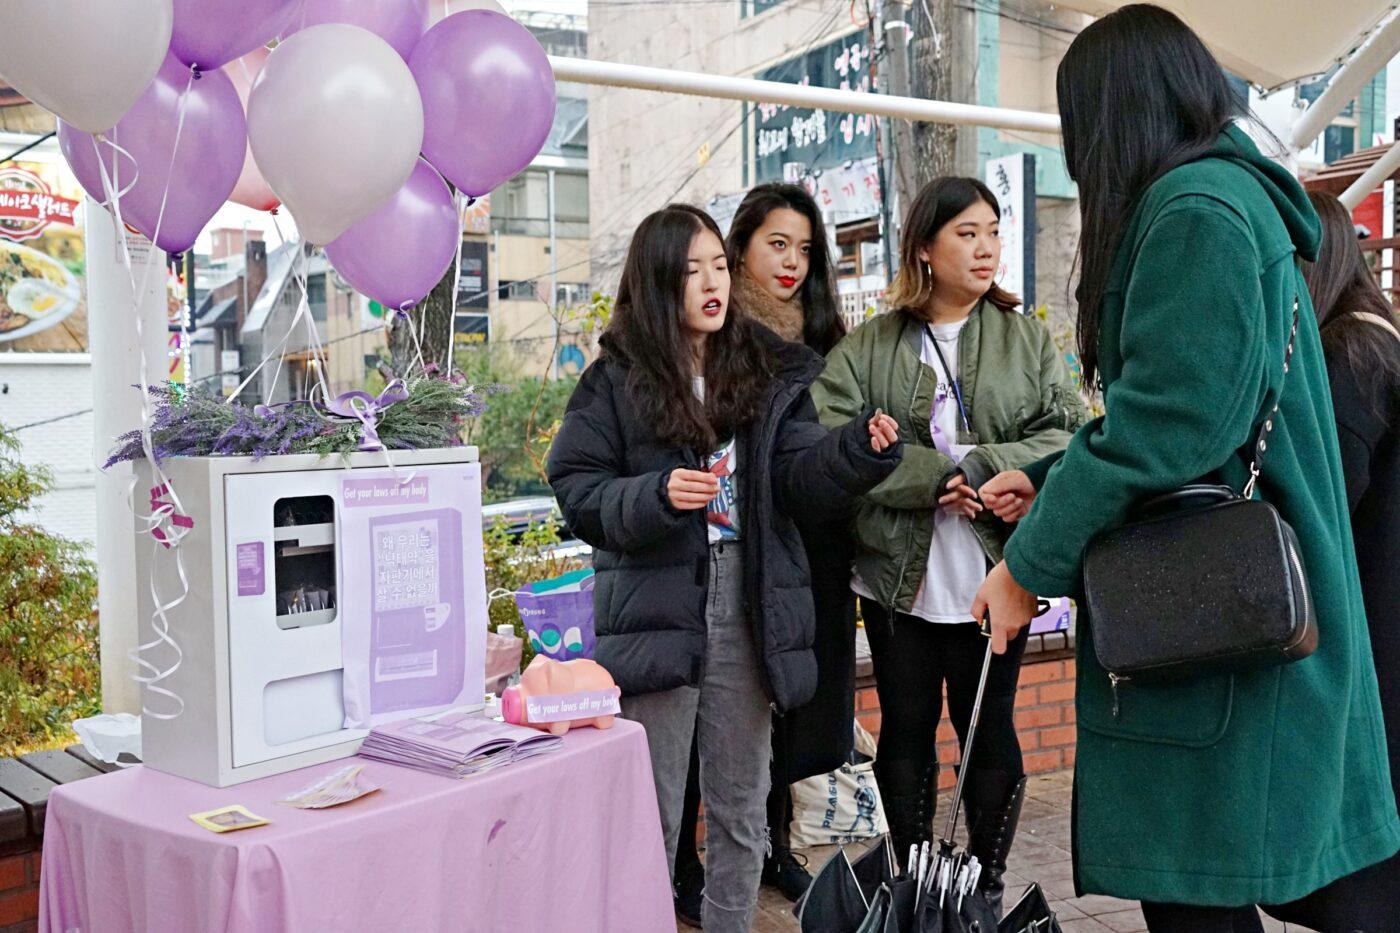 2017 Abortion Pill Vending Machine Performance - Femidangdang